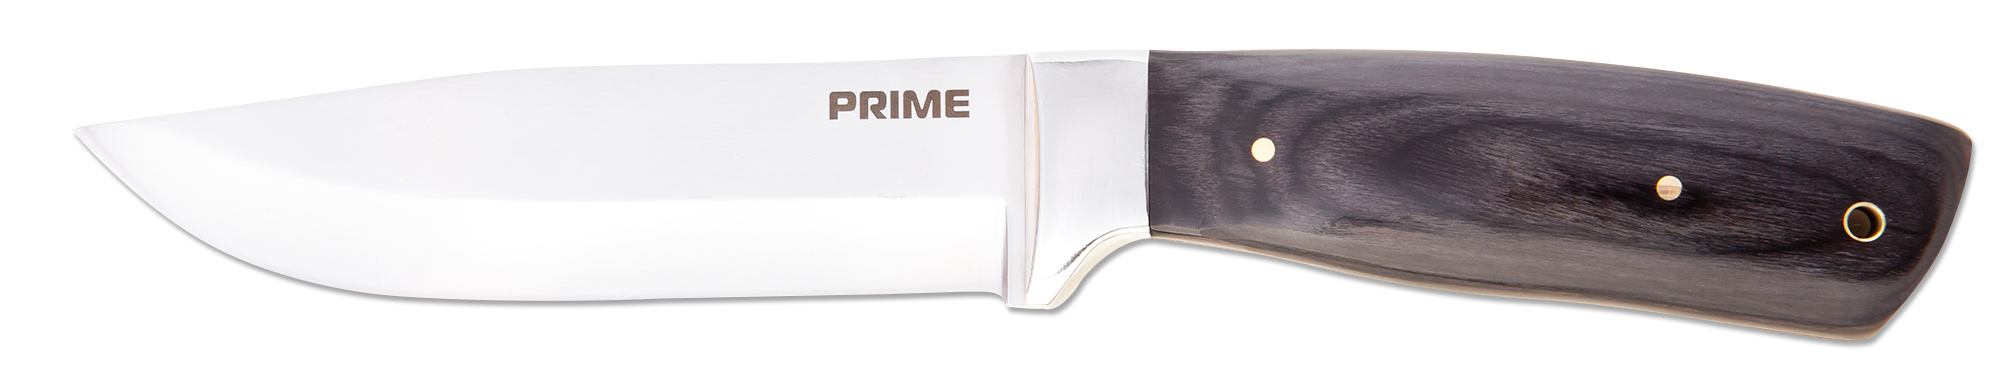 Фото 2 - Туристический Нож Prime